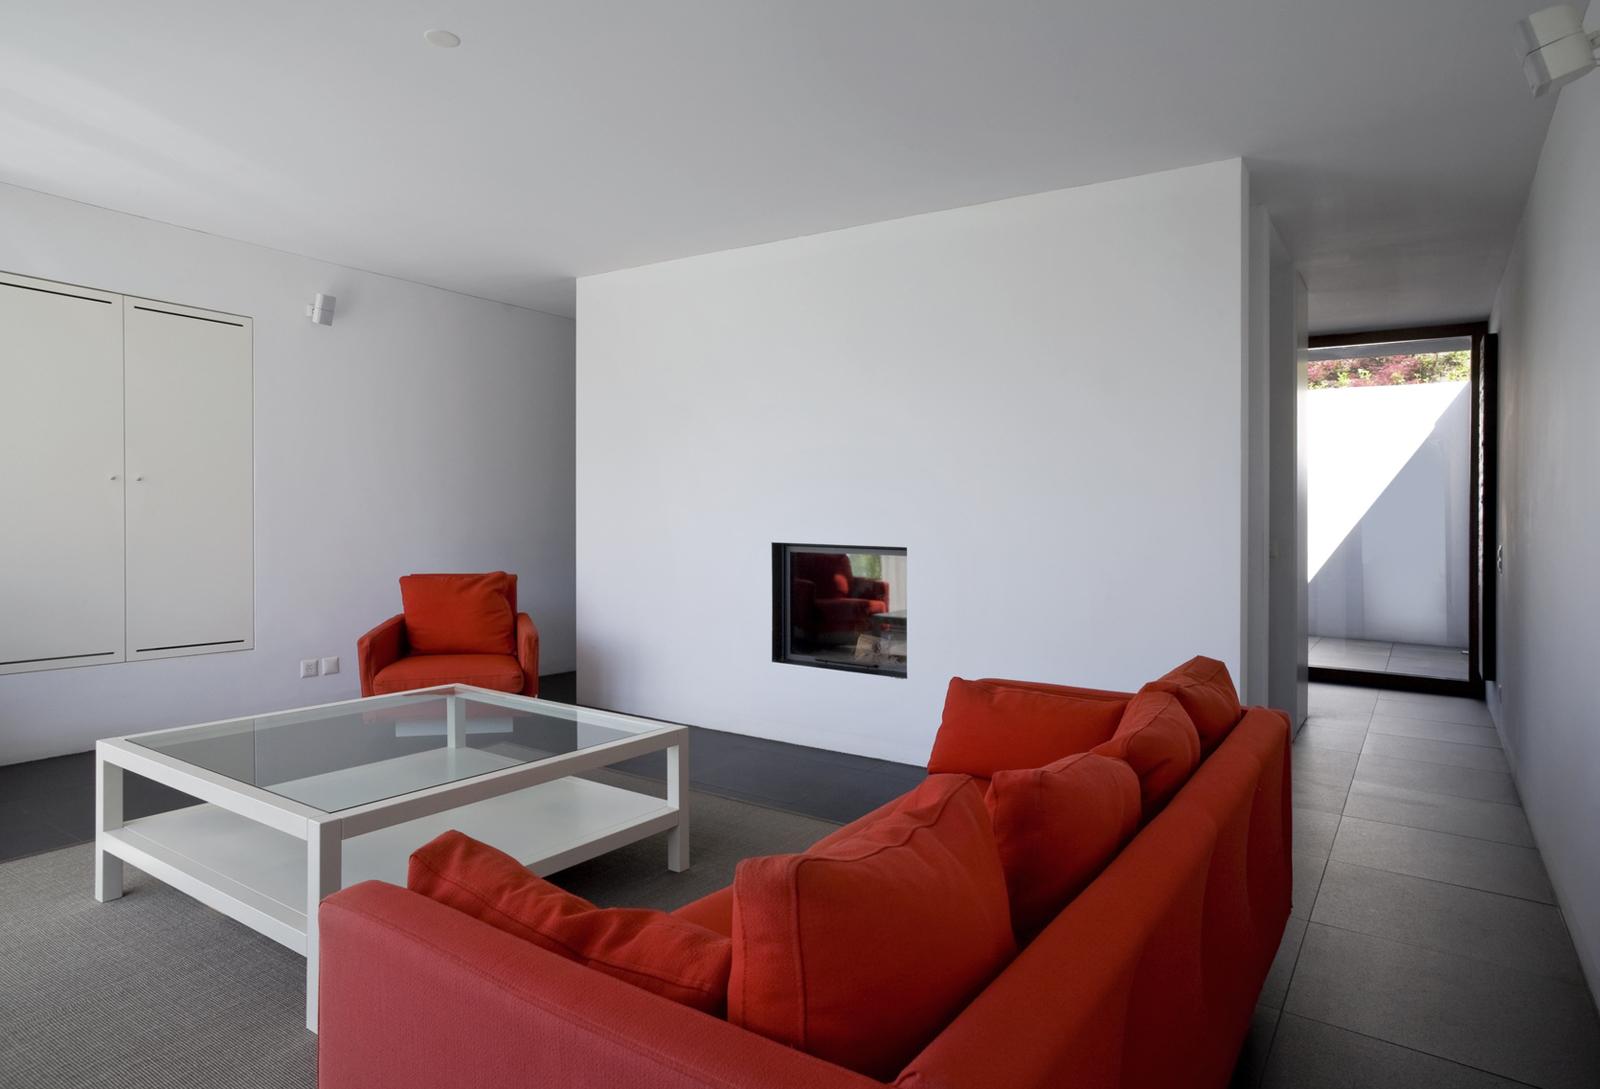 pourquoi installer une cloison. Black Bedroom Furniture Sets. Home Design Ideas